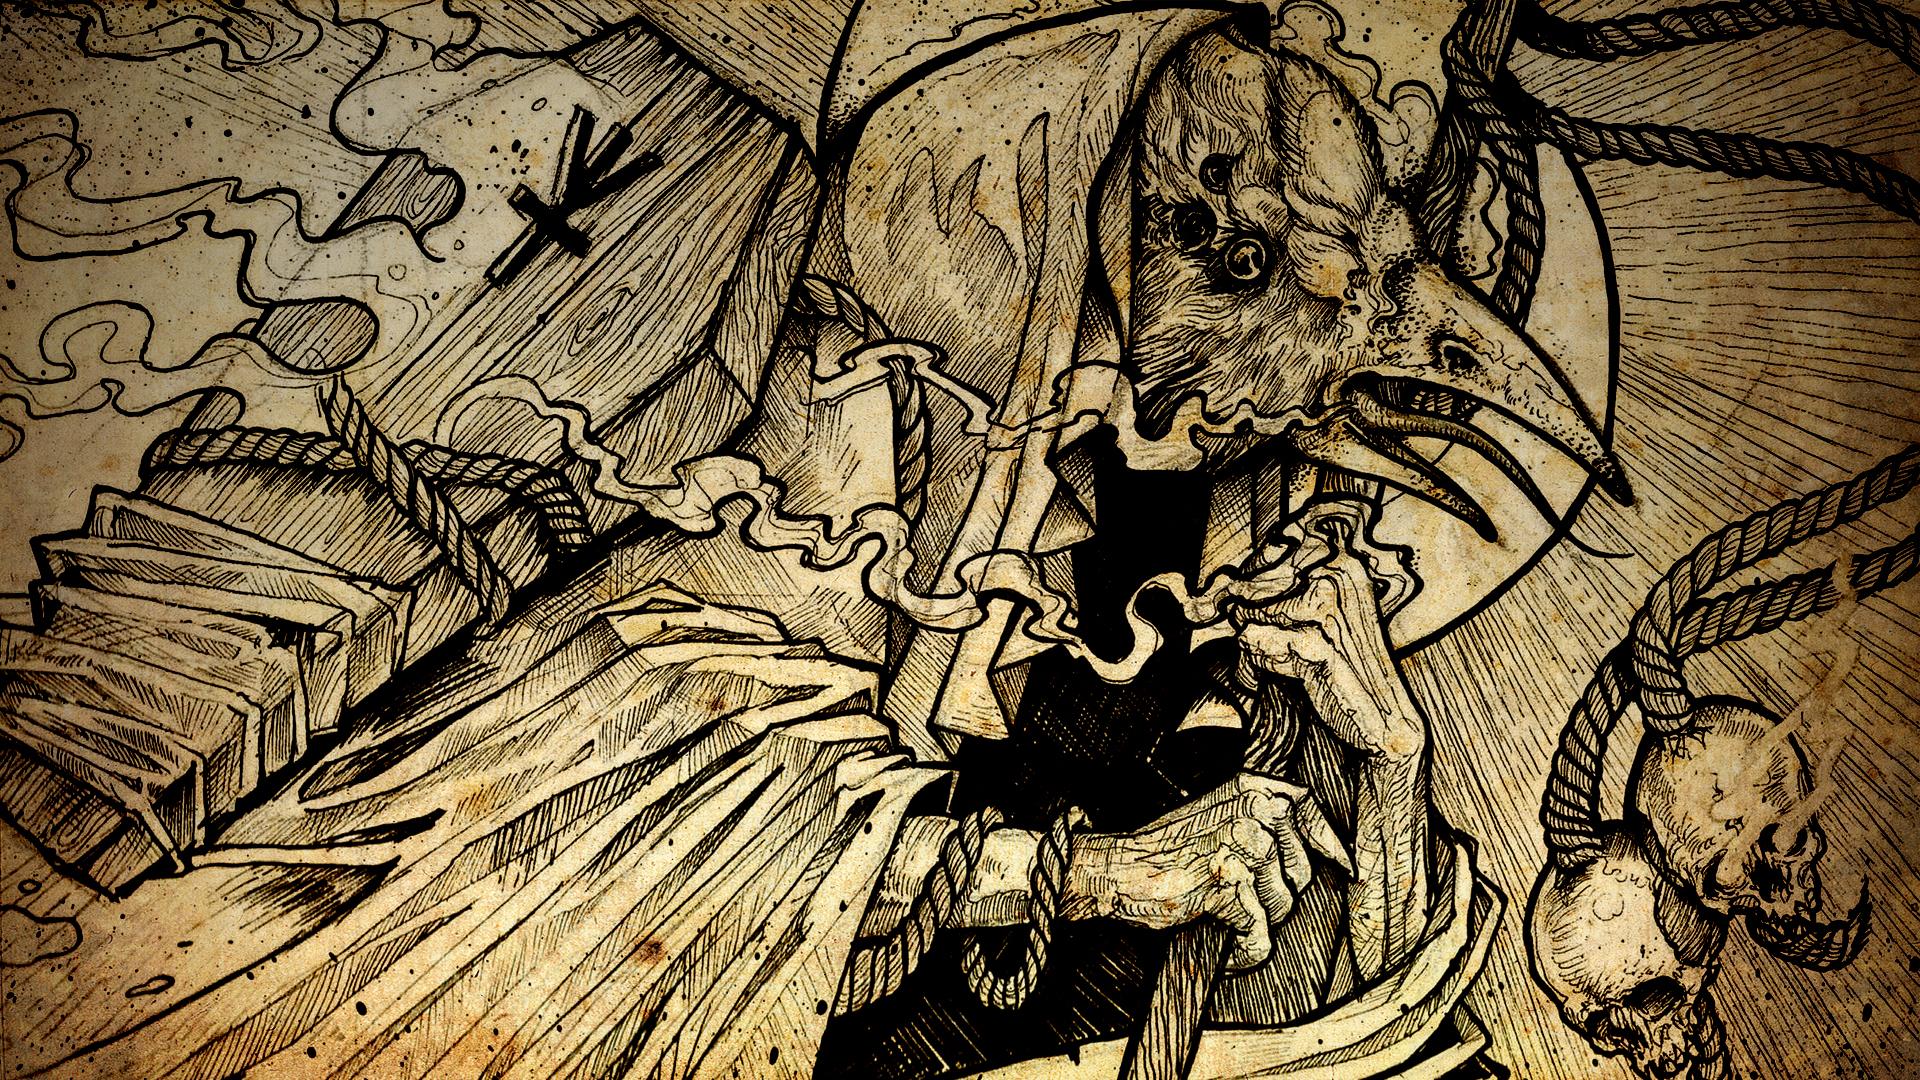 Dark goth gothic raven occult skulls skulls reaper 1920x1080